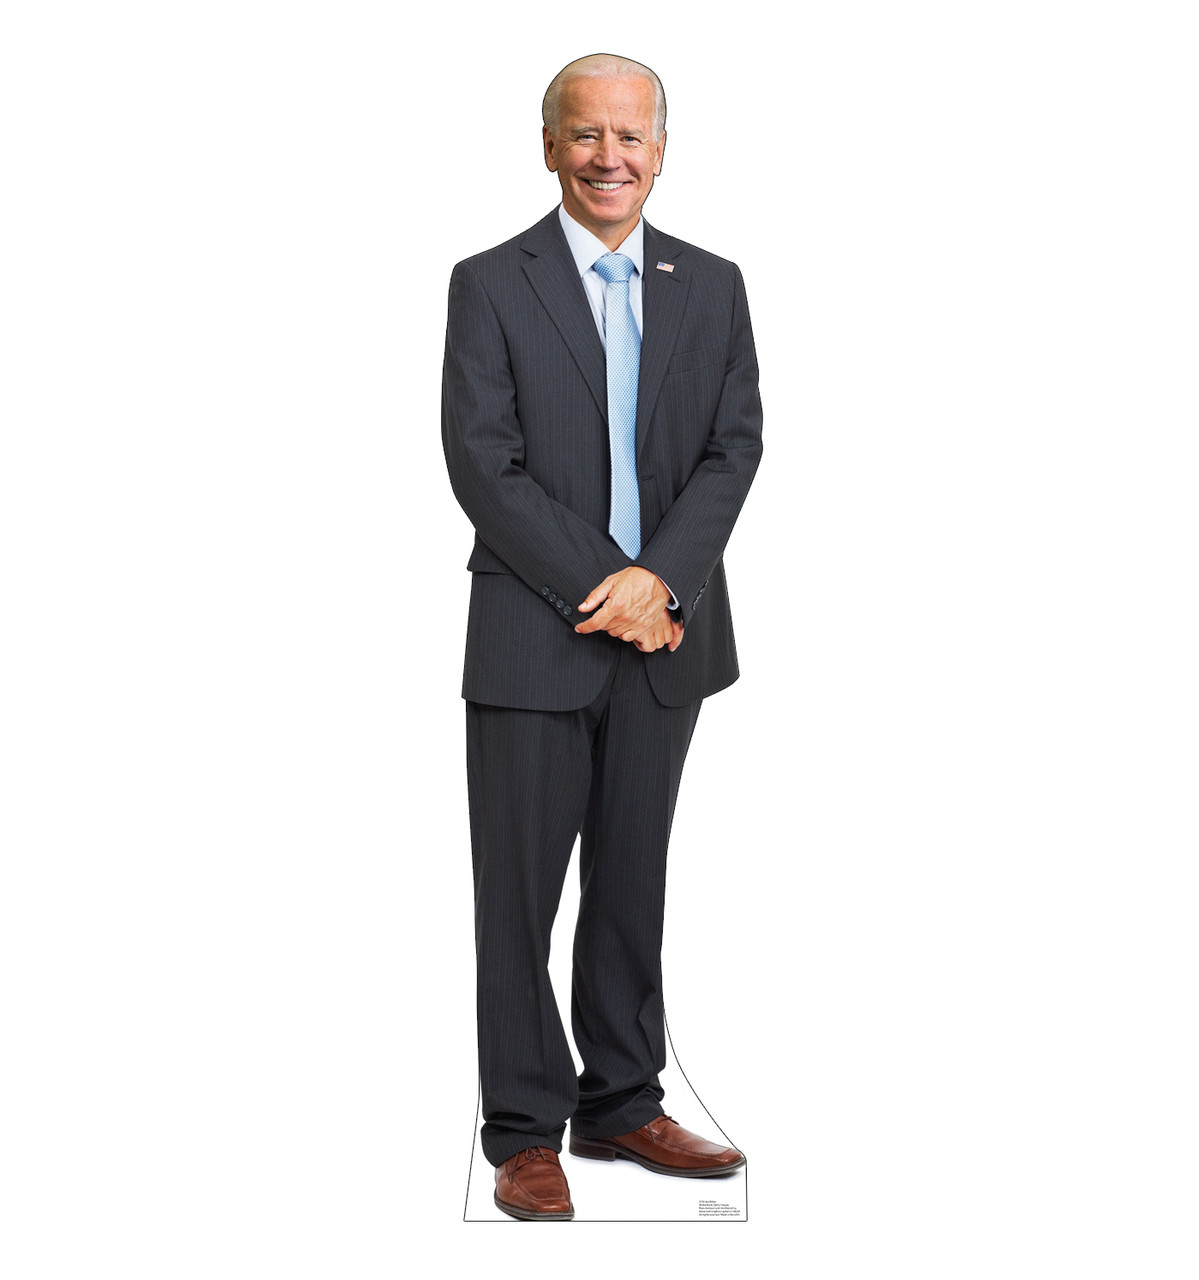 Life-size cardboard standee of Joe Biden.